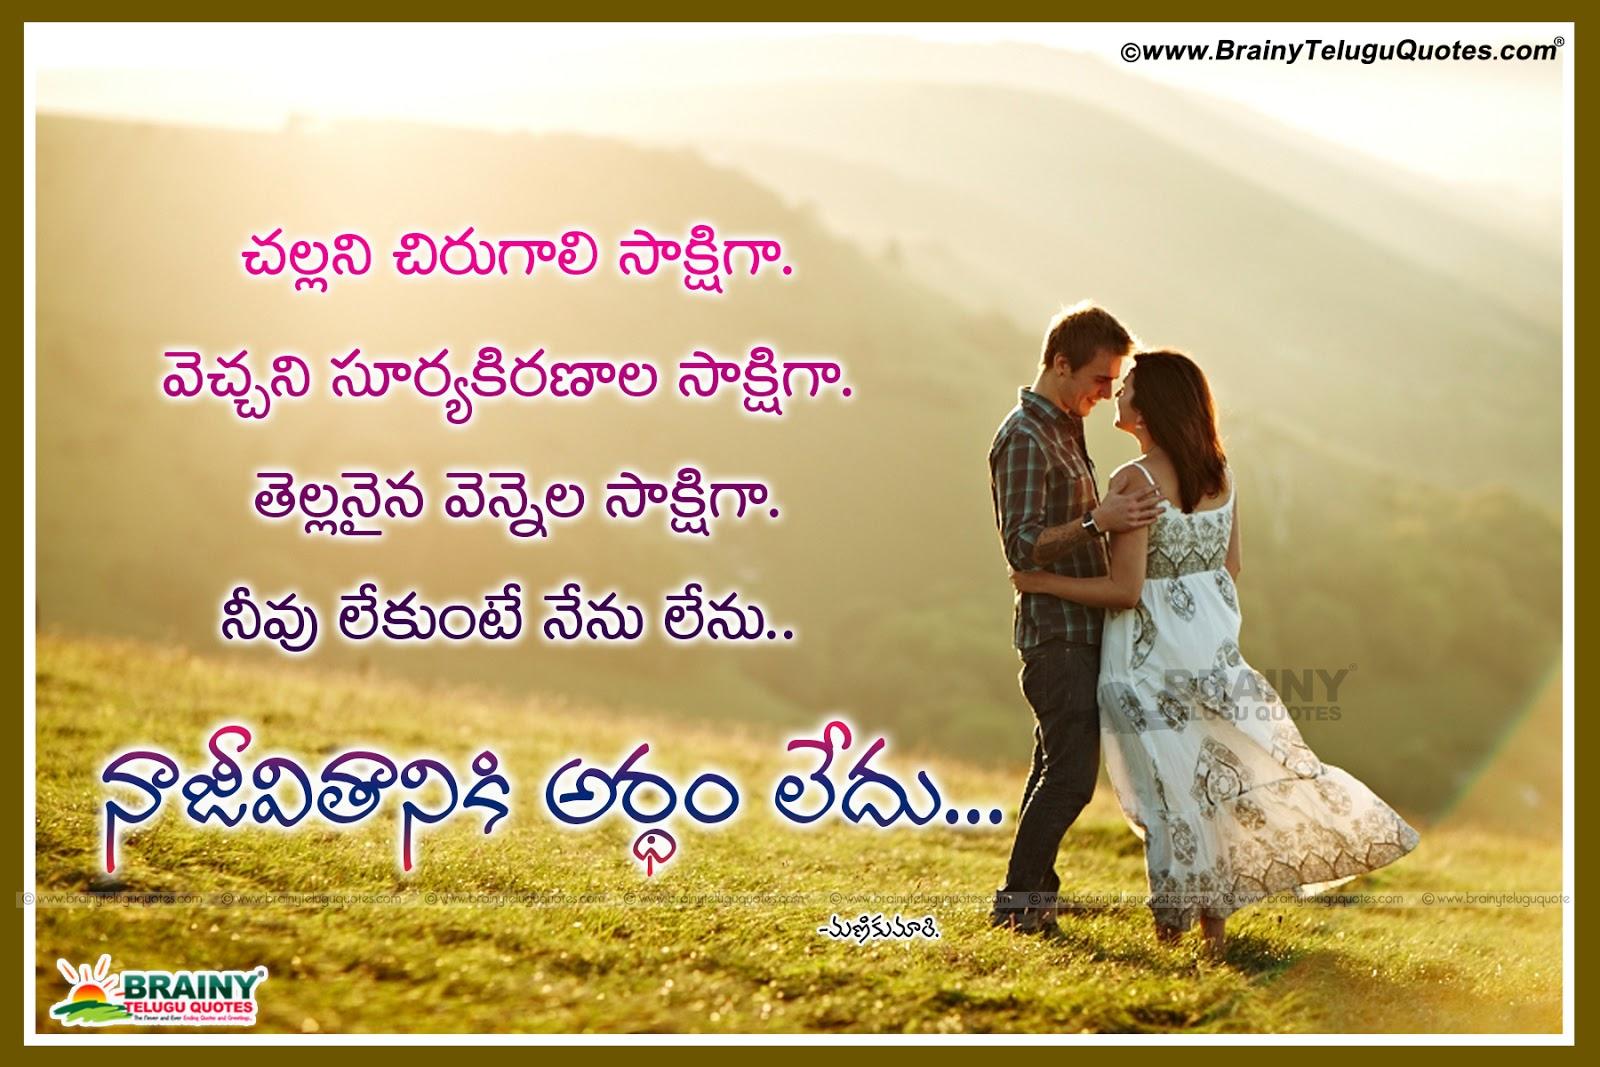 Love Romantic Quotes Romantic Telugu Love Quotes With Cute Couple Hd Wallpaper